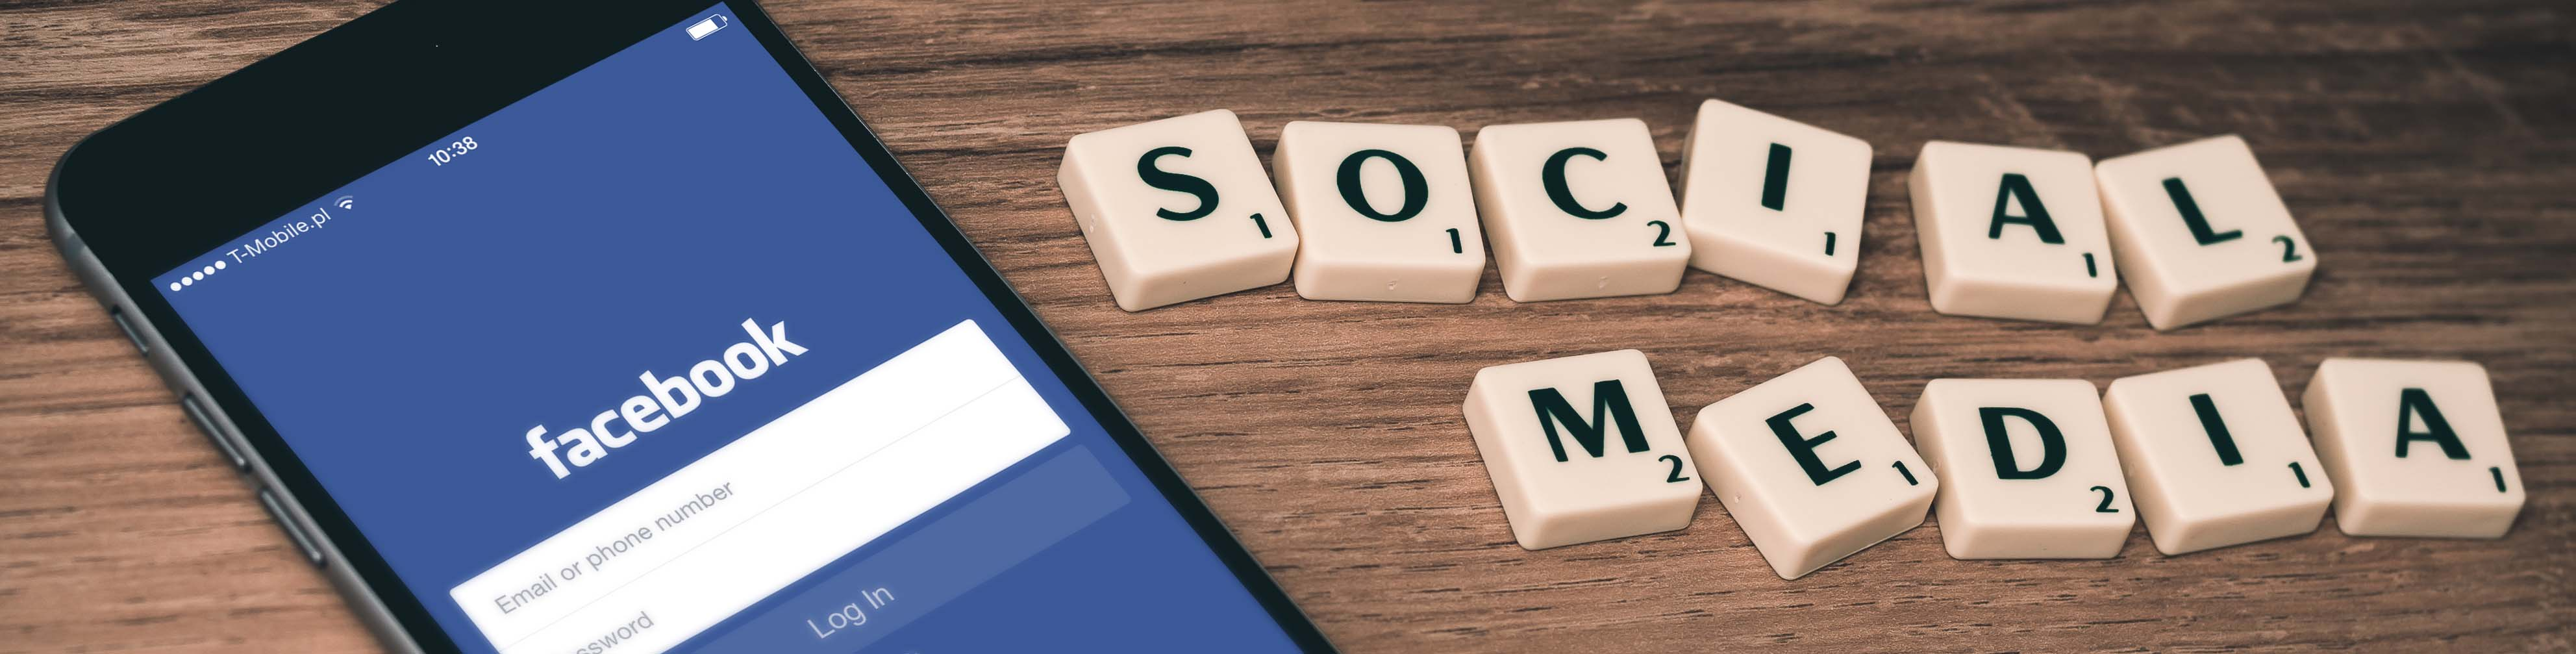 facebook_smartphone_social-media_web_william-iven